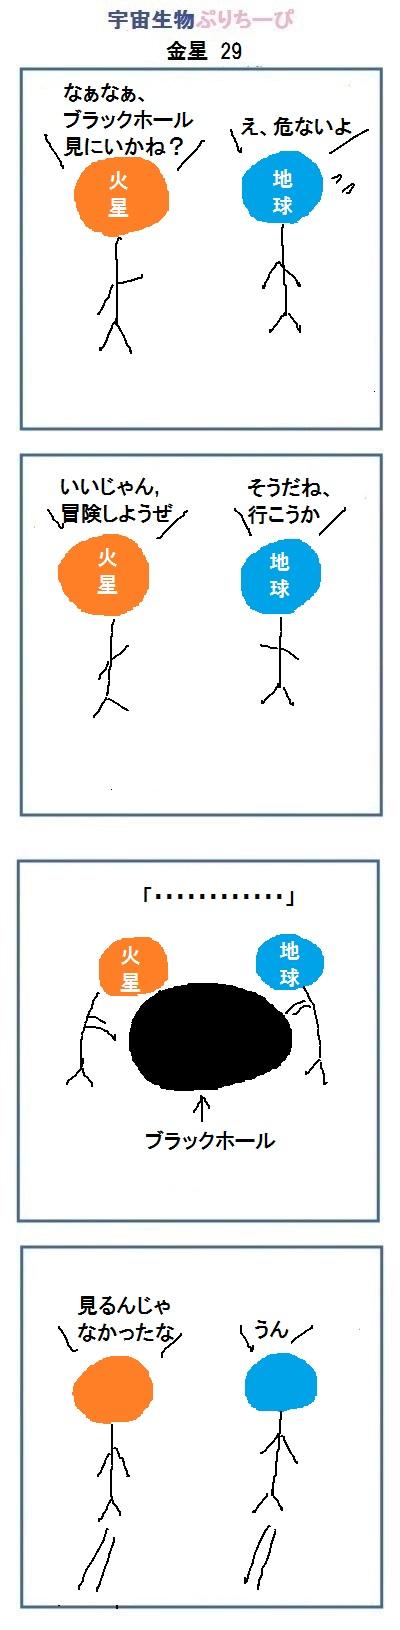 160624_kinsei29.jpg